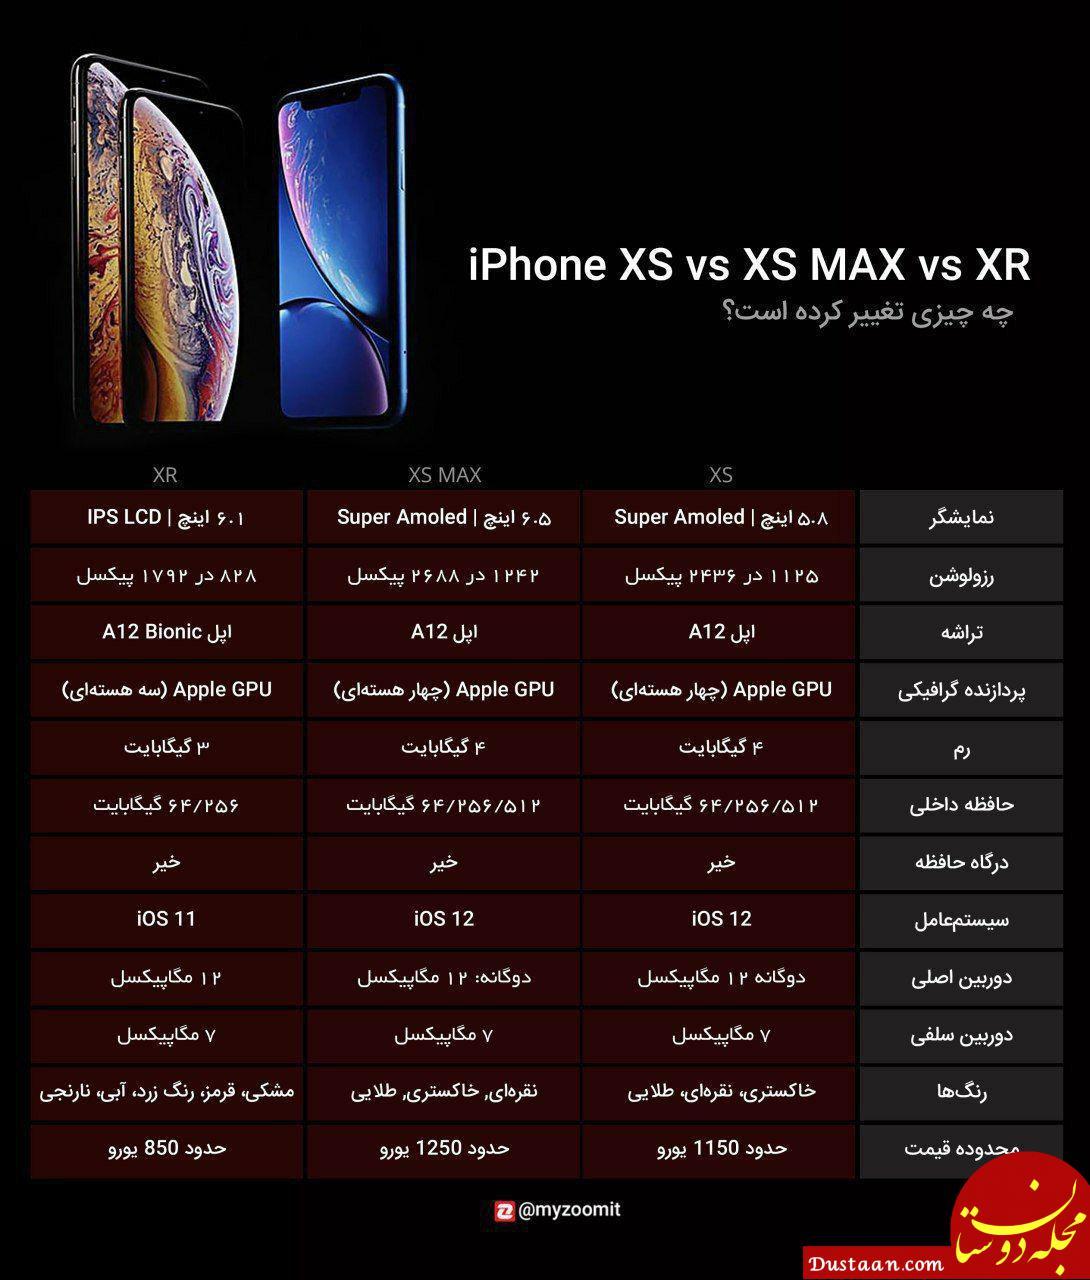 www.dustaan.com مشخصات کامل آیفون های جدید اپل